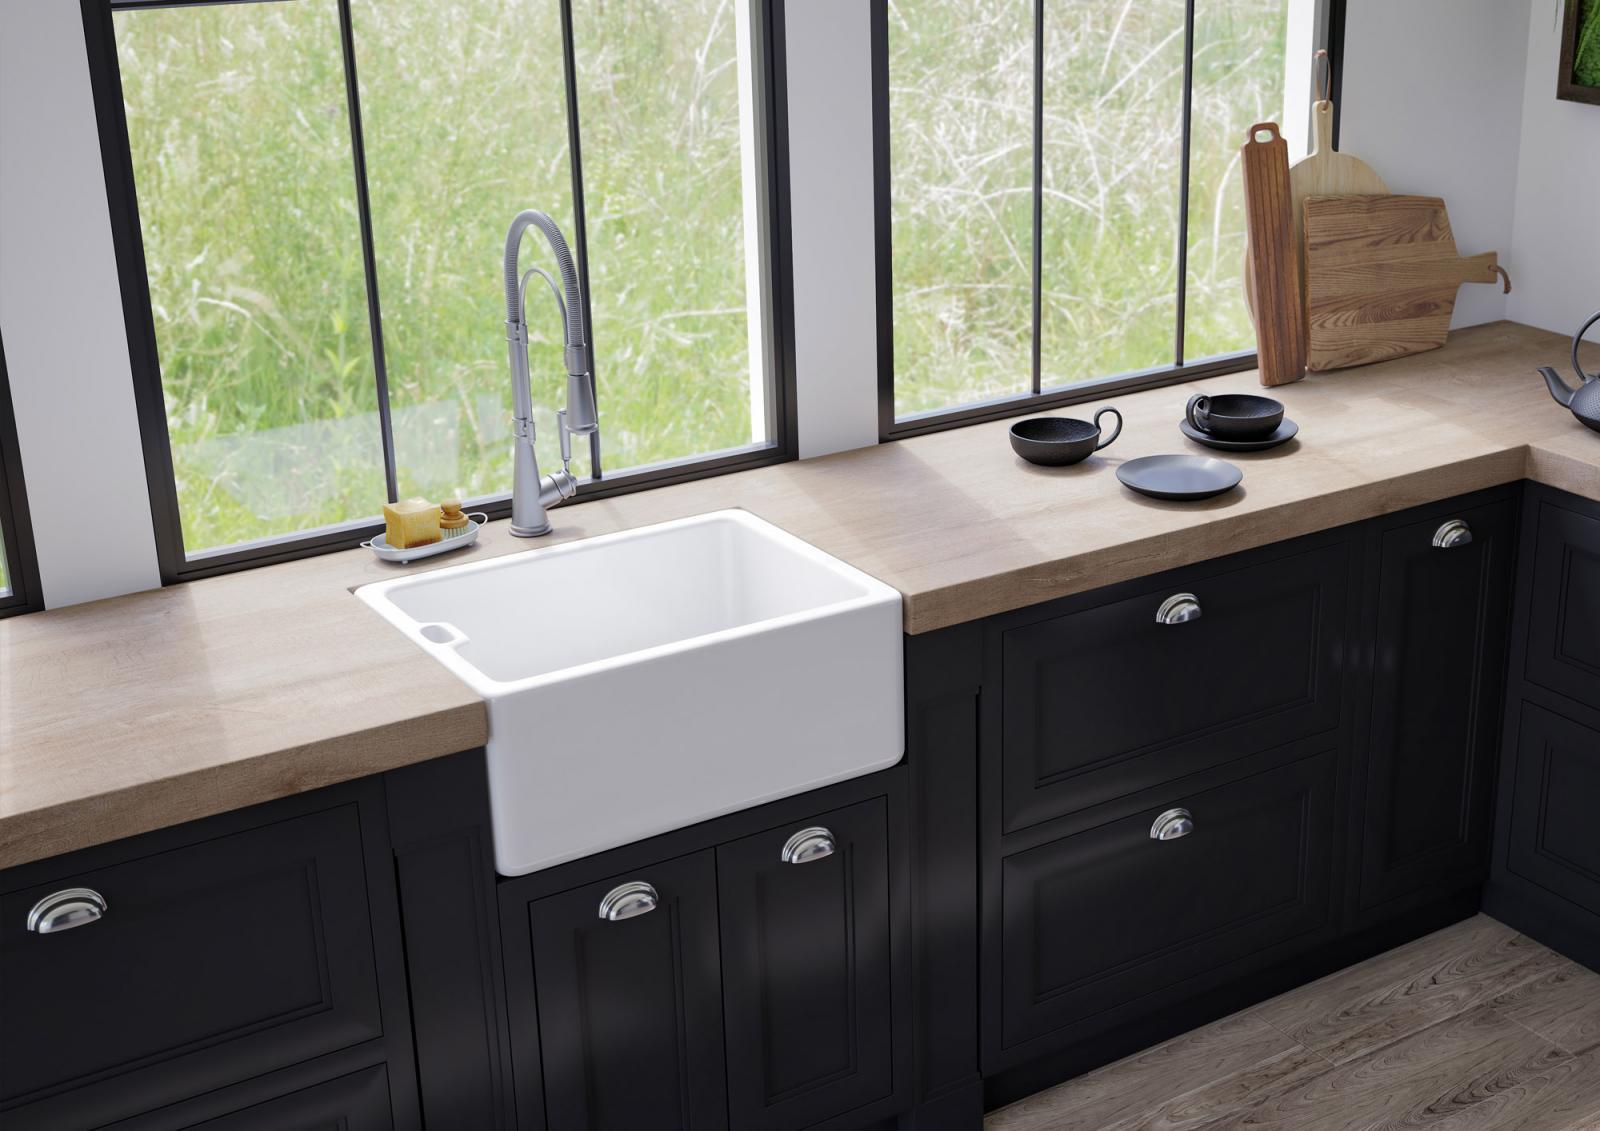 High-quality sink Clovis - single bowl, ceramic - ambience 1